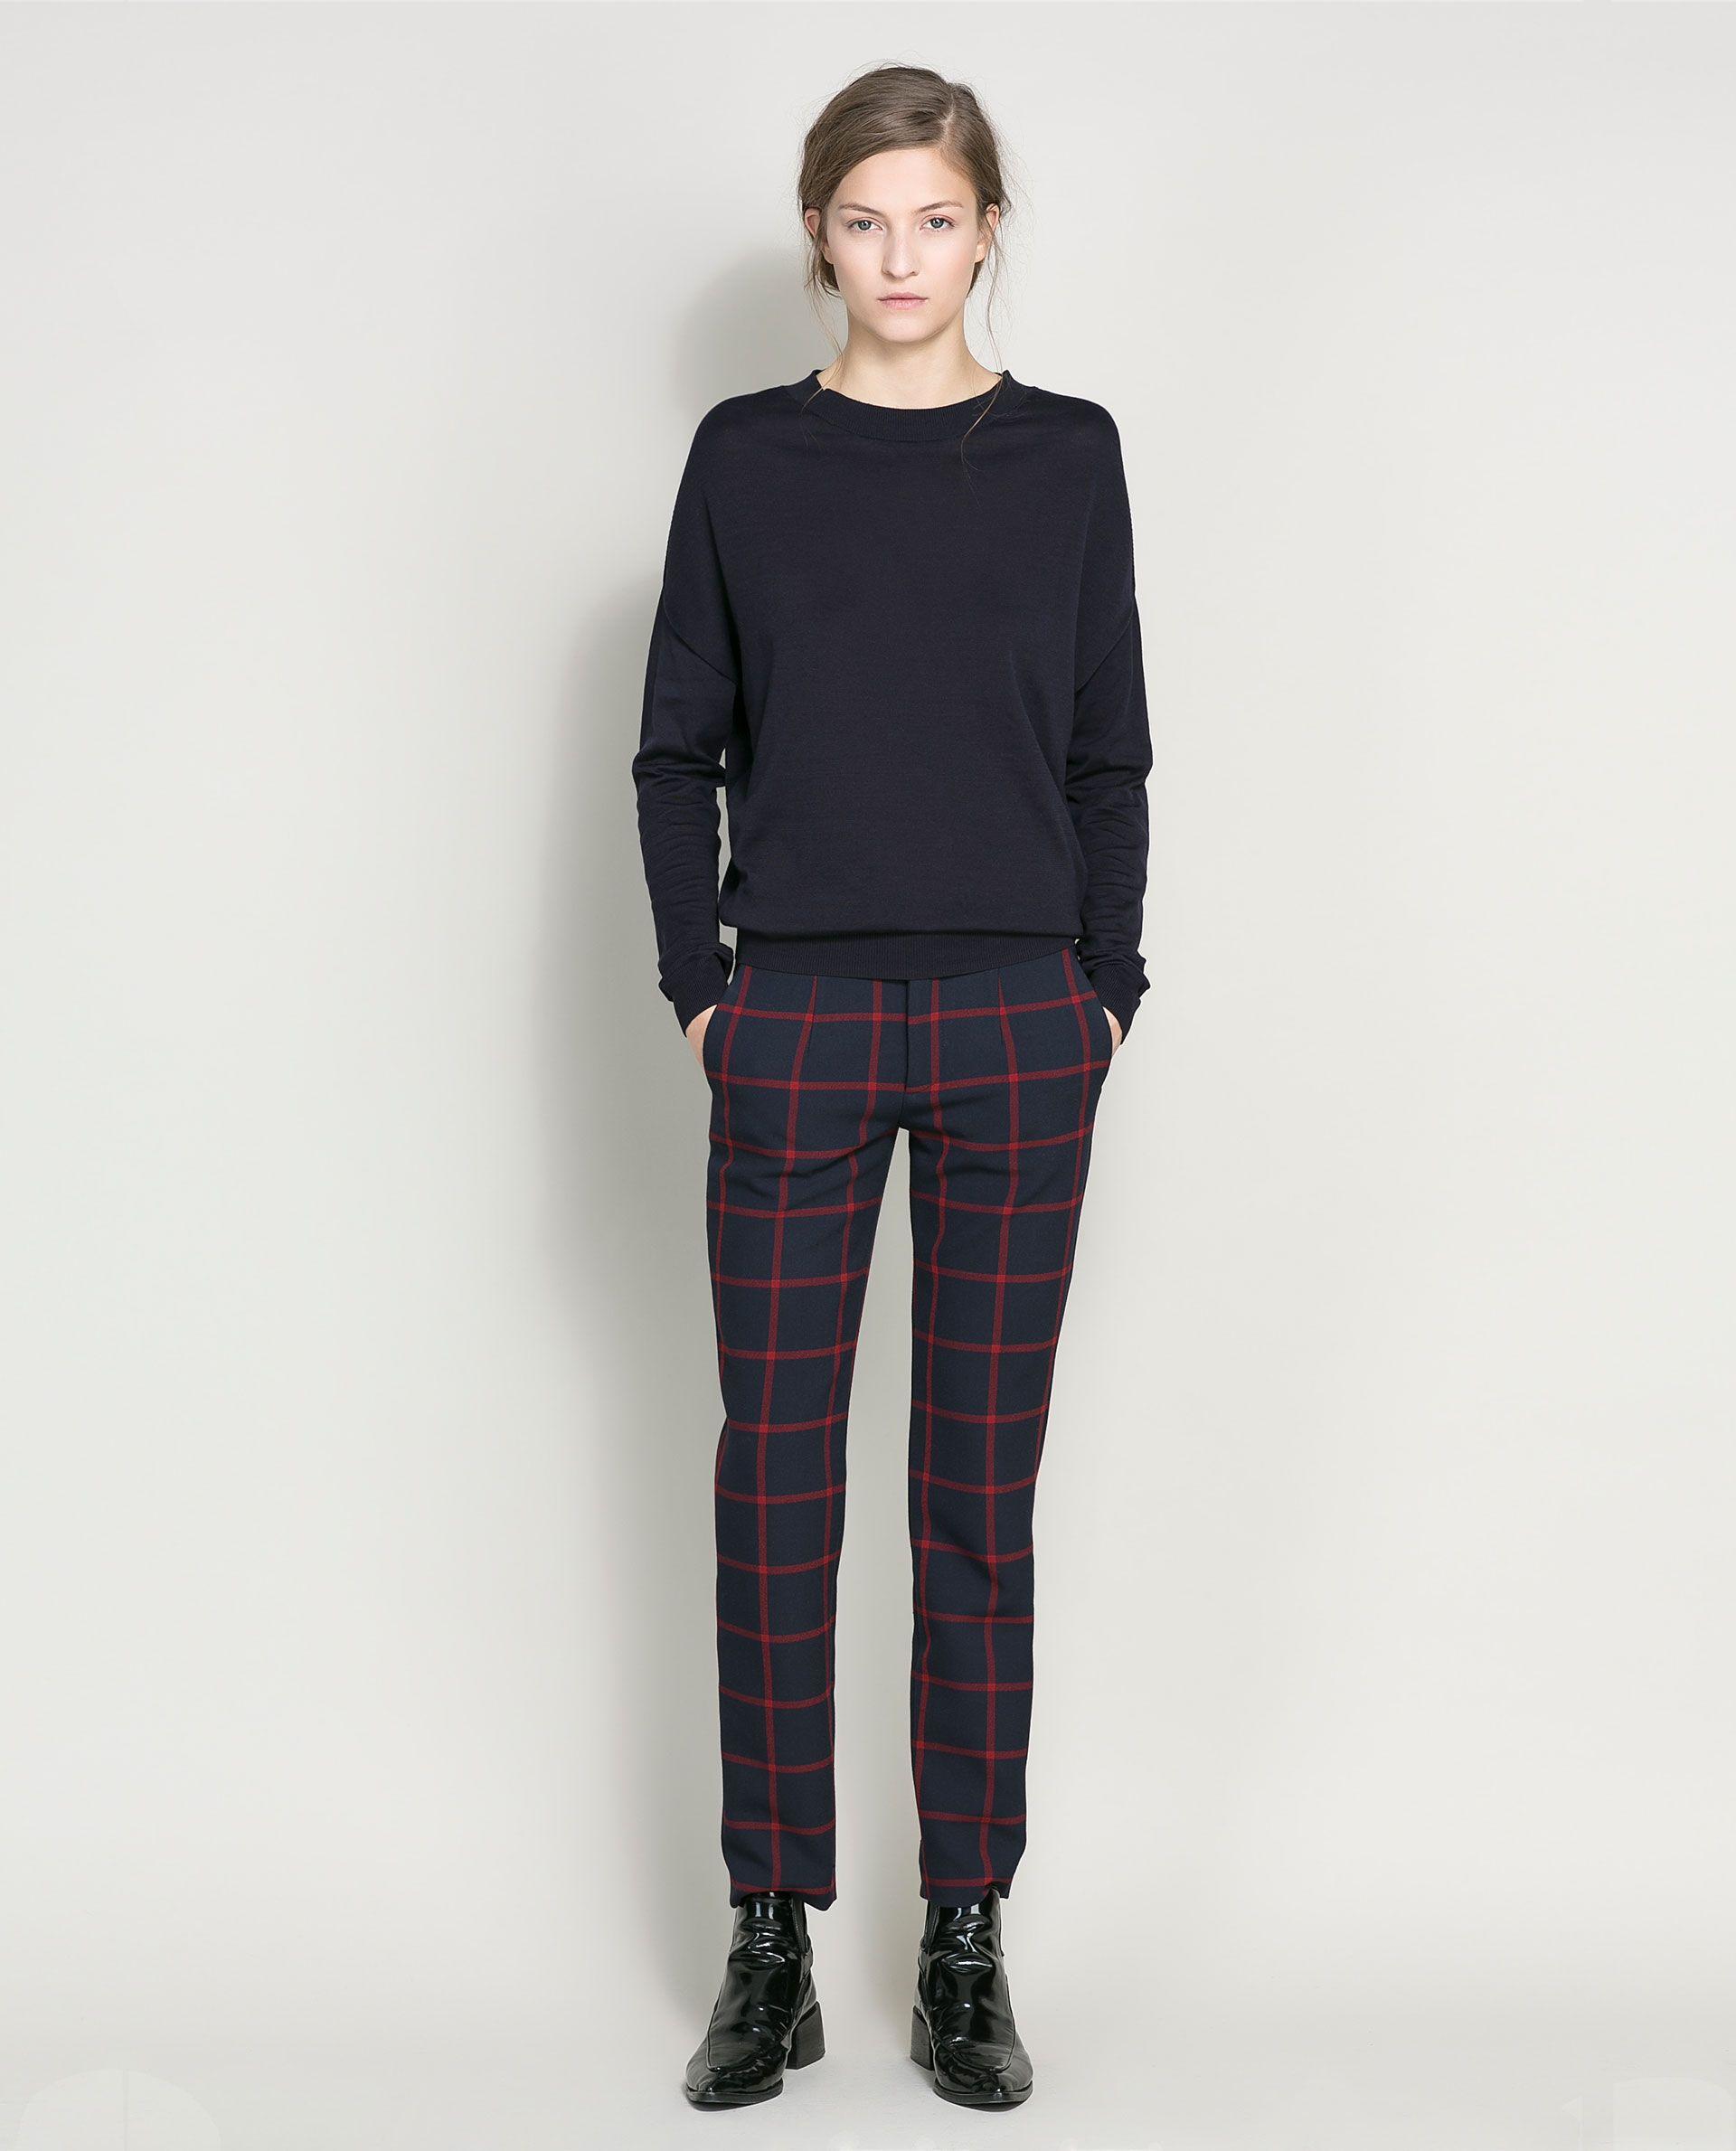 COTTON SILK JUMPER - Knitwear - Woman   ZARA Canada